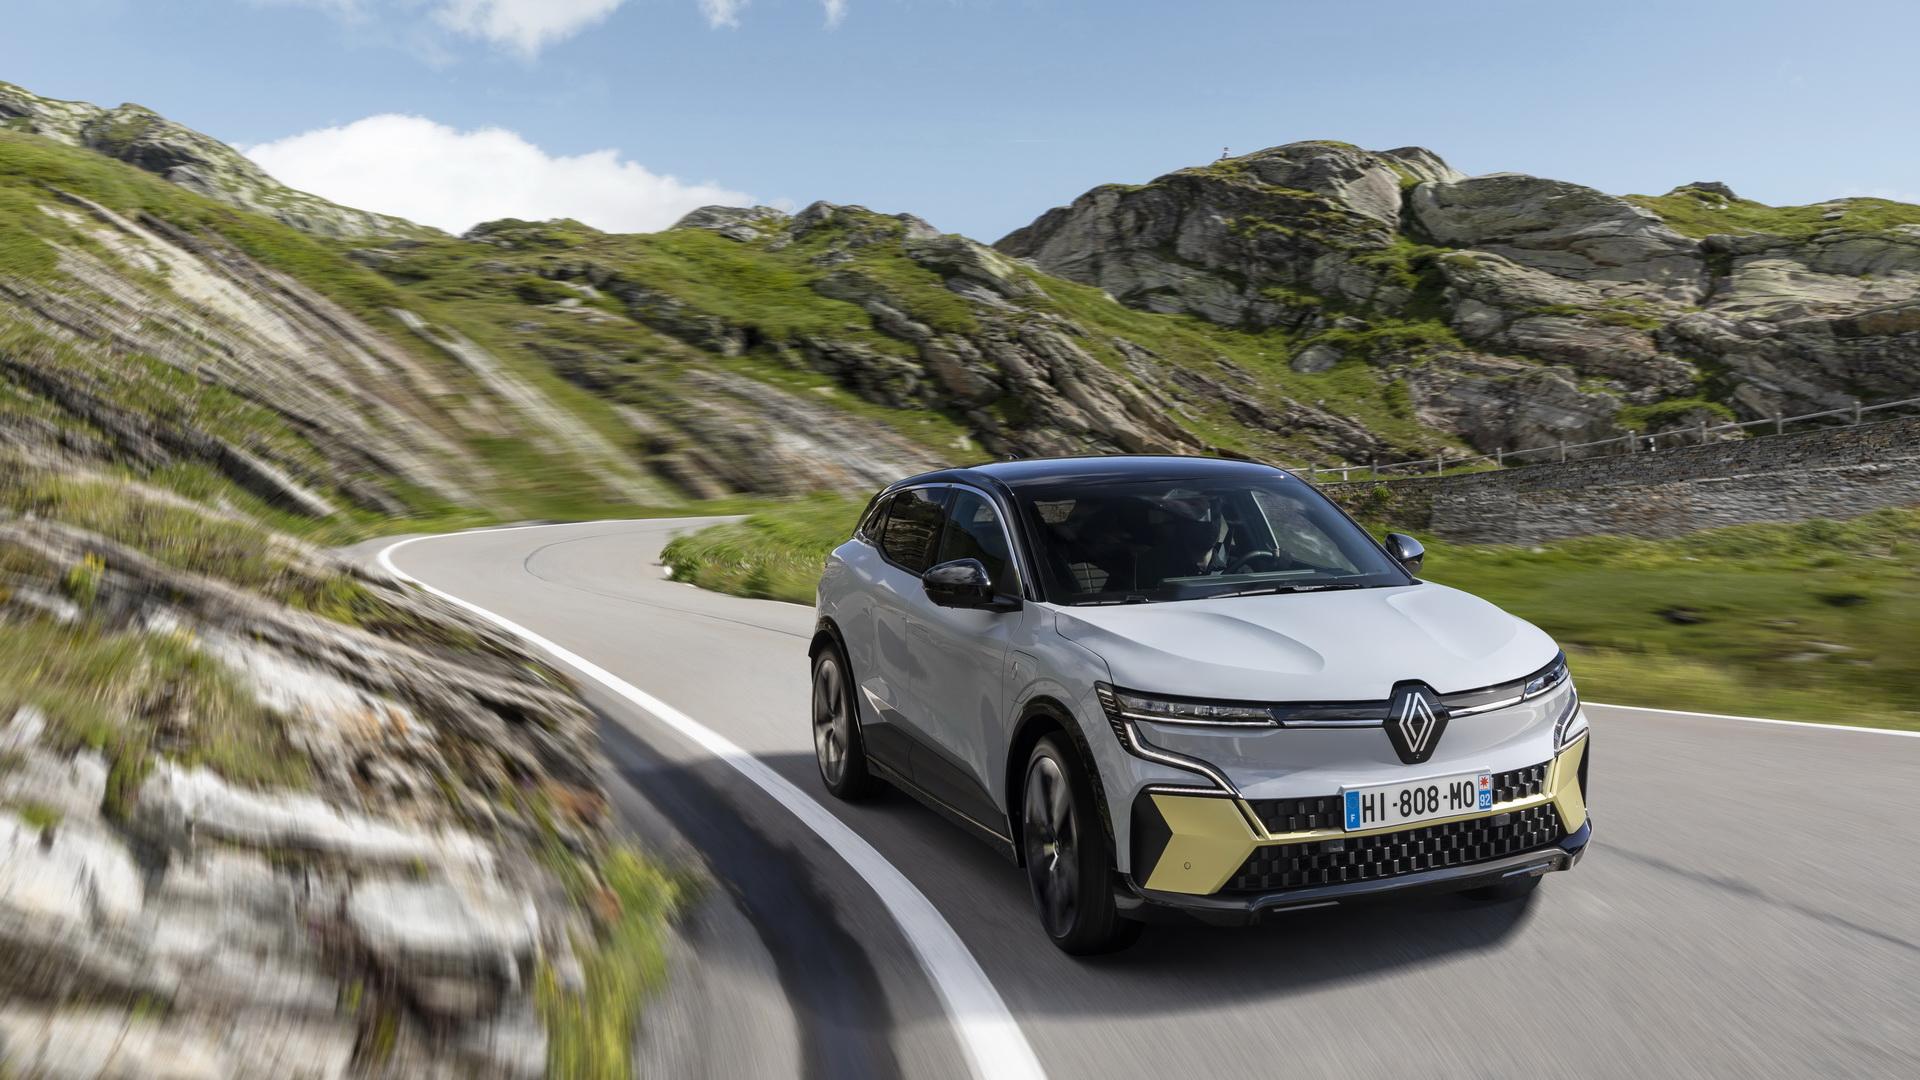 Renault: Αποκαλυπτήρια για το ηλεκτρικό Mégane – Πότε το περιμένουμε στην Ελλάδα; (video)